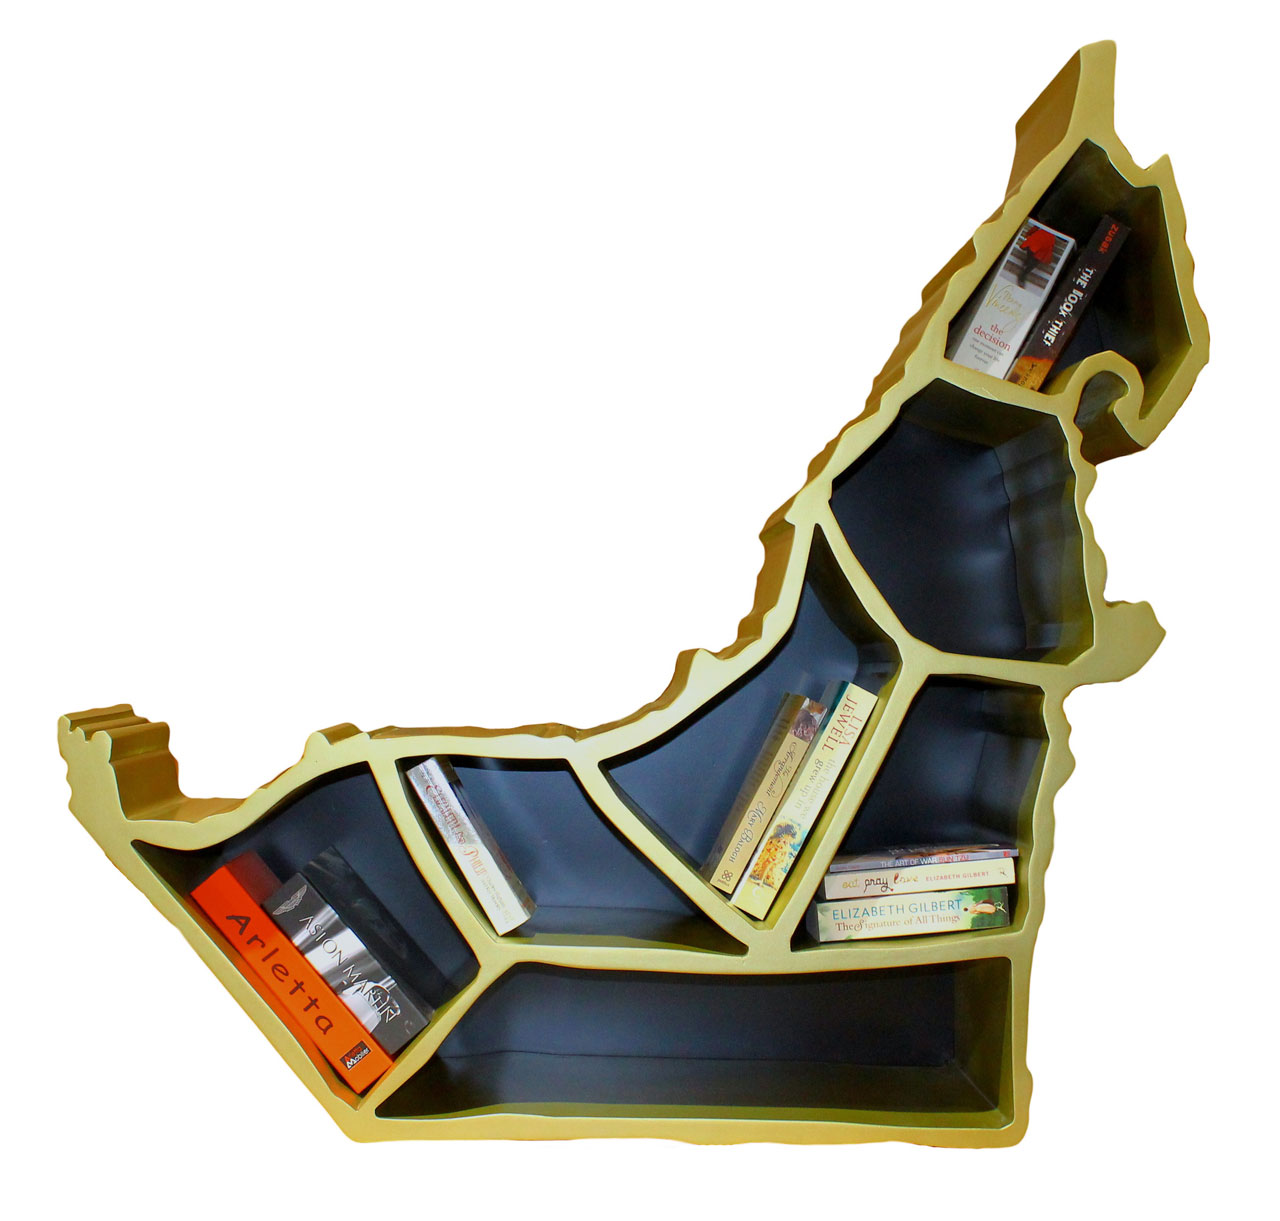 Emiraty Shelf by IBDAA.MDF Wood coated with black and gold paint.